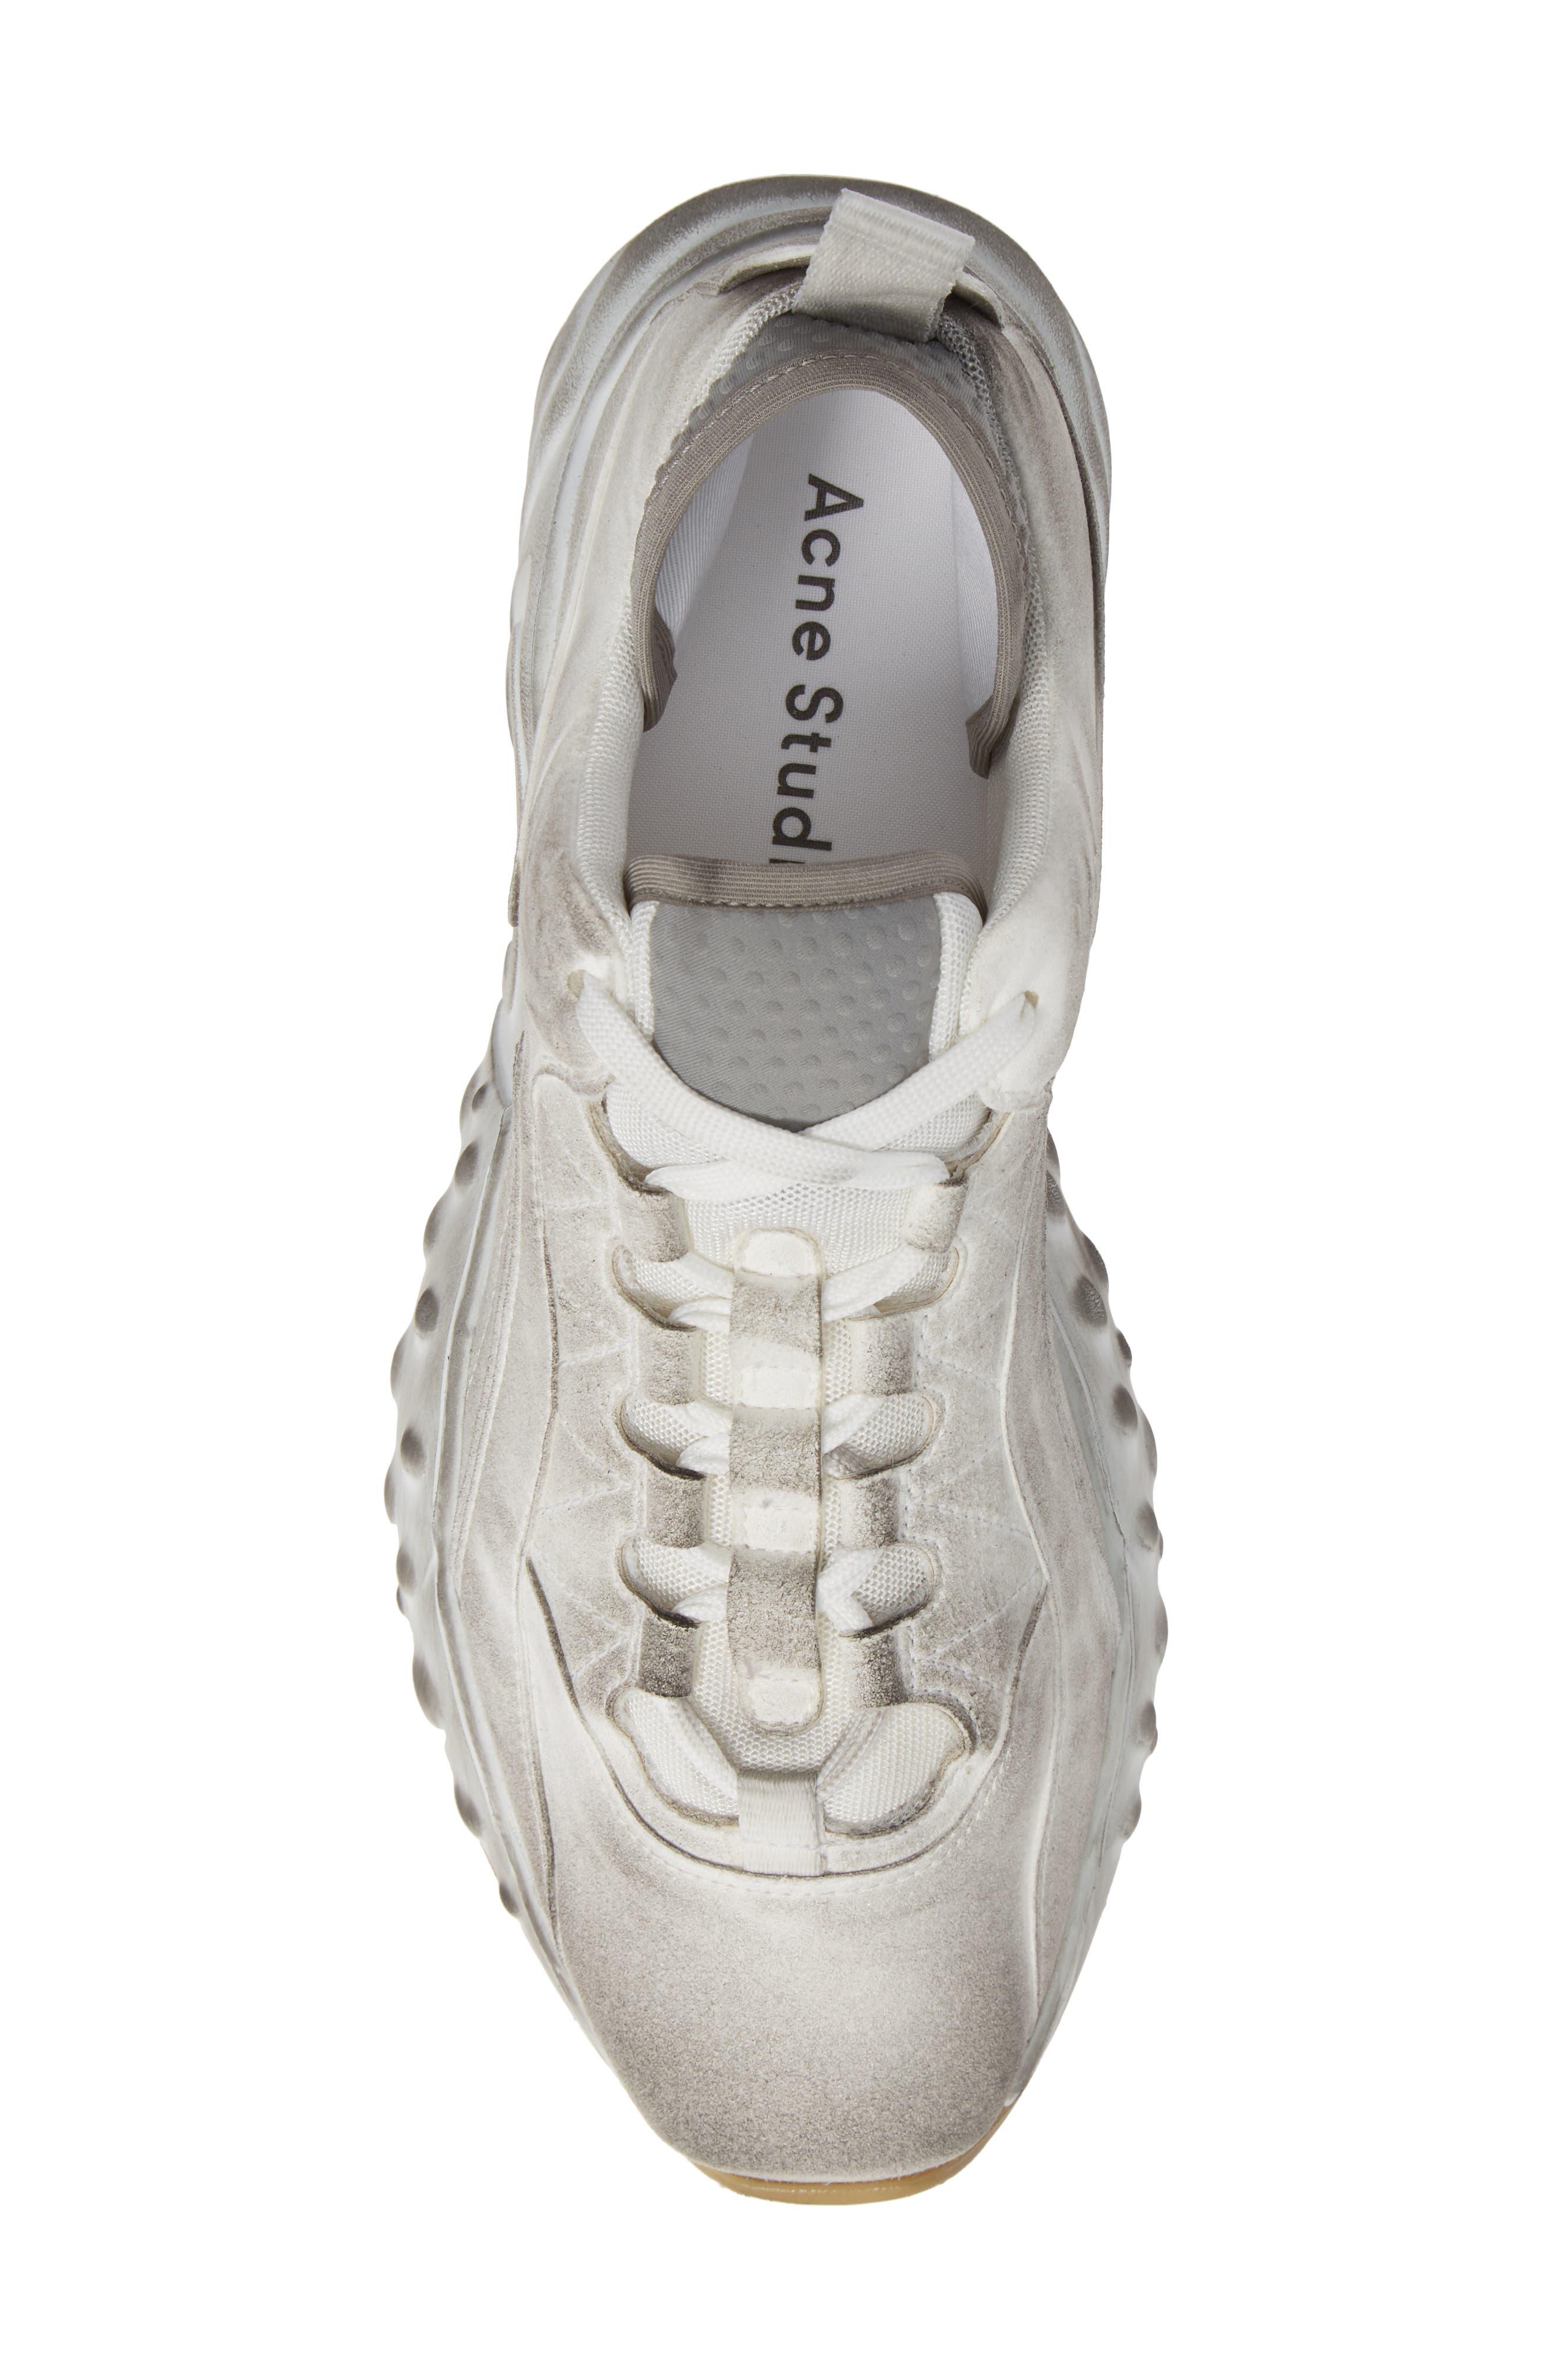 Rockaway Built-Up Sneaker,                             Alternate thumbnail 5, color,                             WHITE